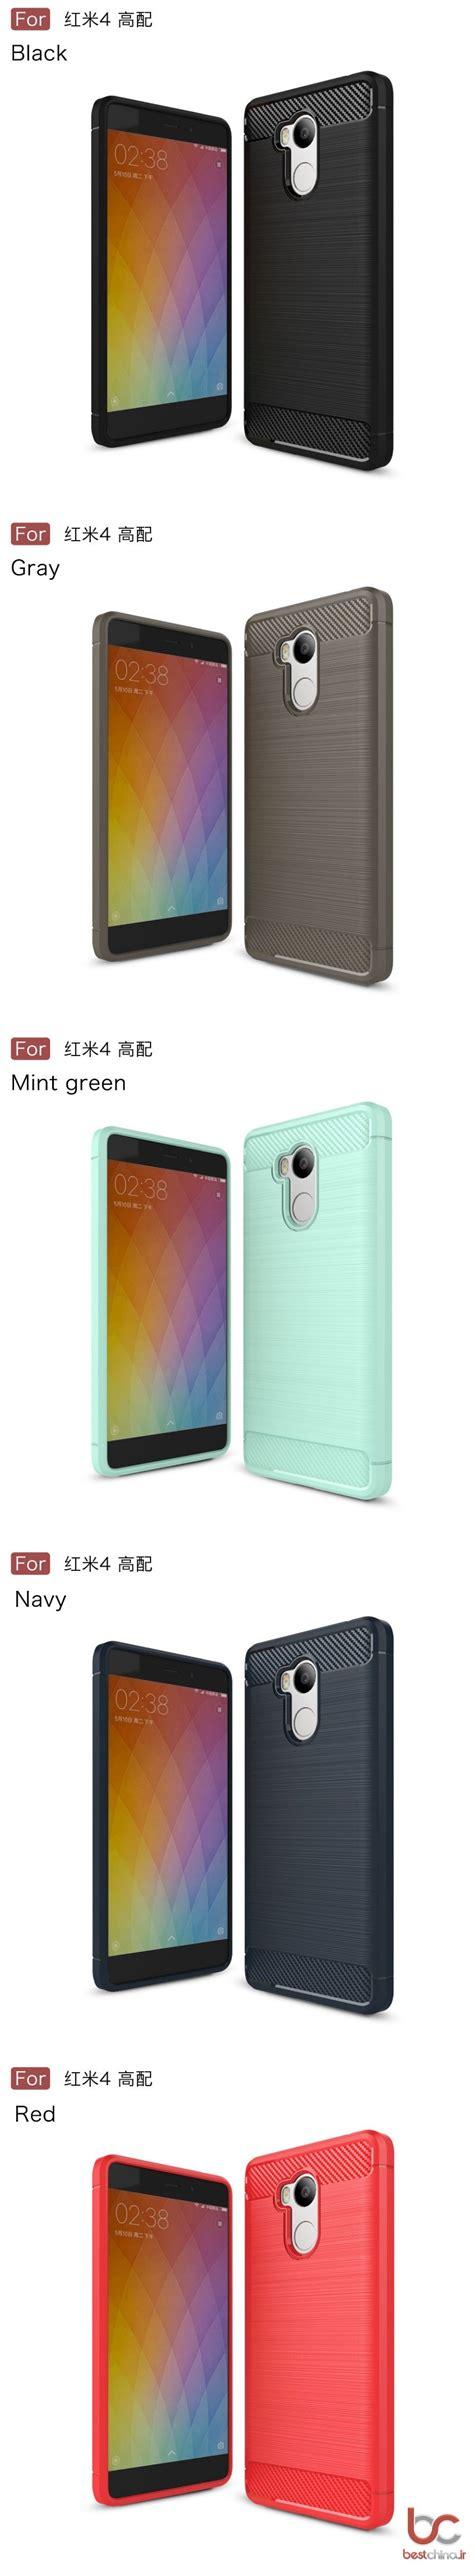 Ipaky Xiaomi Redmi 4 Prime Back Coverarmorslimhard 崧 崧 綷 綷 綷 綷 4 綷 xiaomi redmi 4 prime